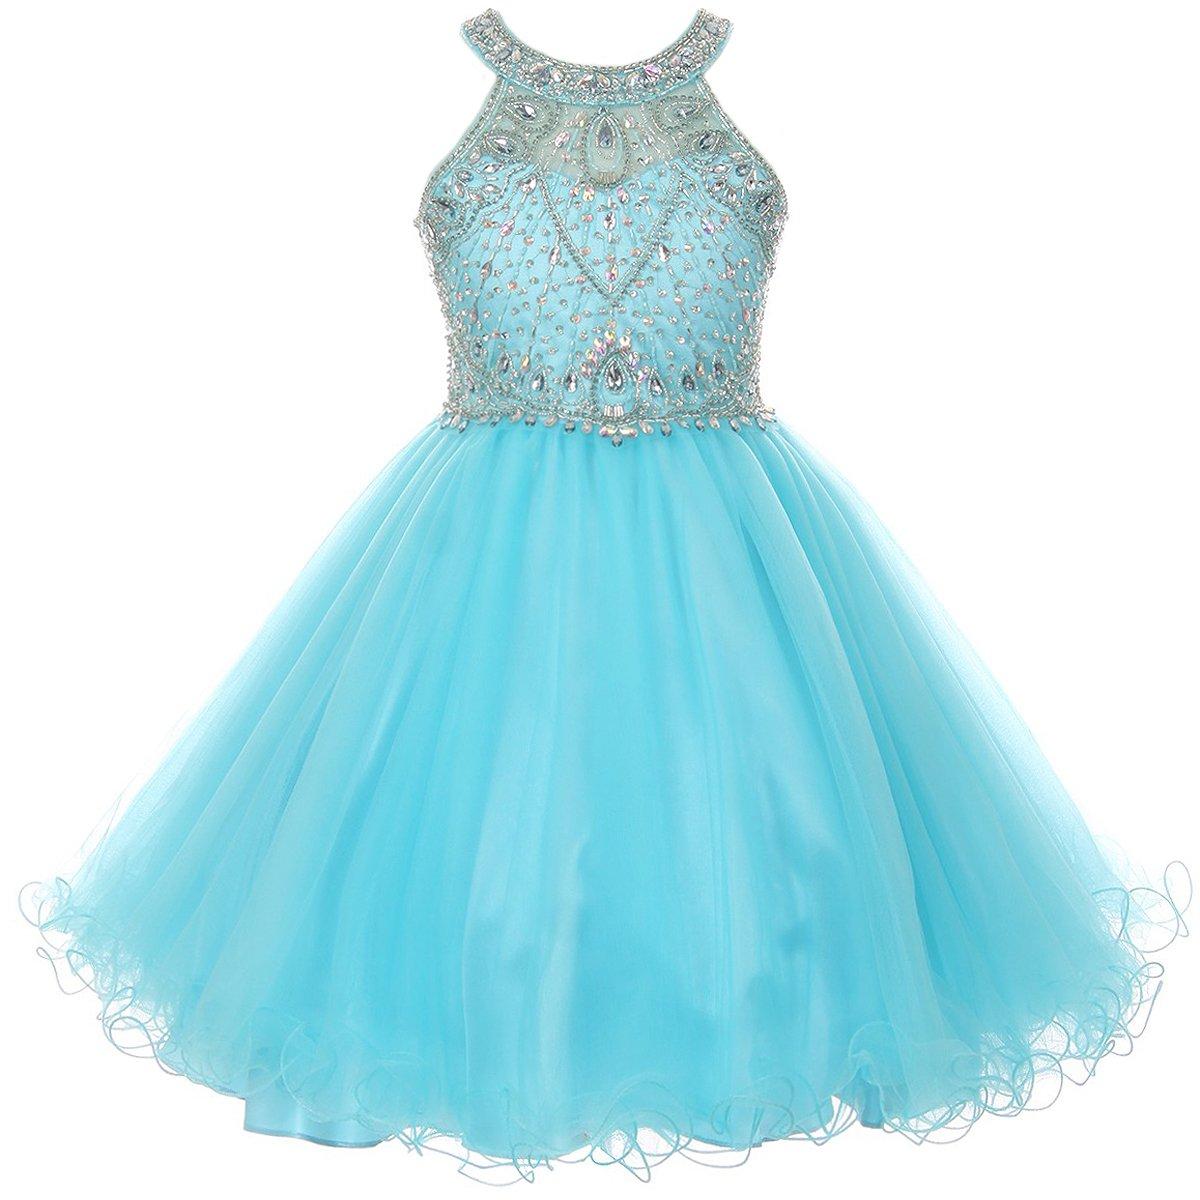 Big Girls Stunning Rhinestones Halter Neck Wired Tulle Corset Back Flower Girl Dress Aqua - Size 10